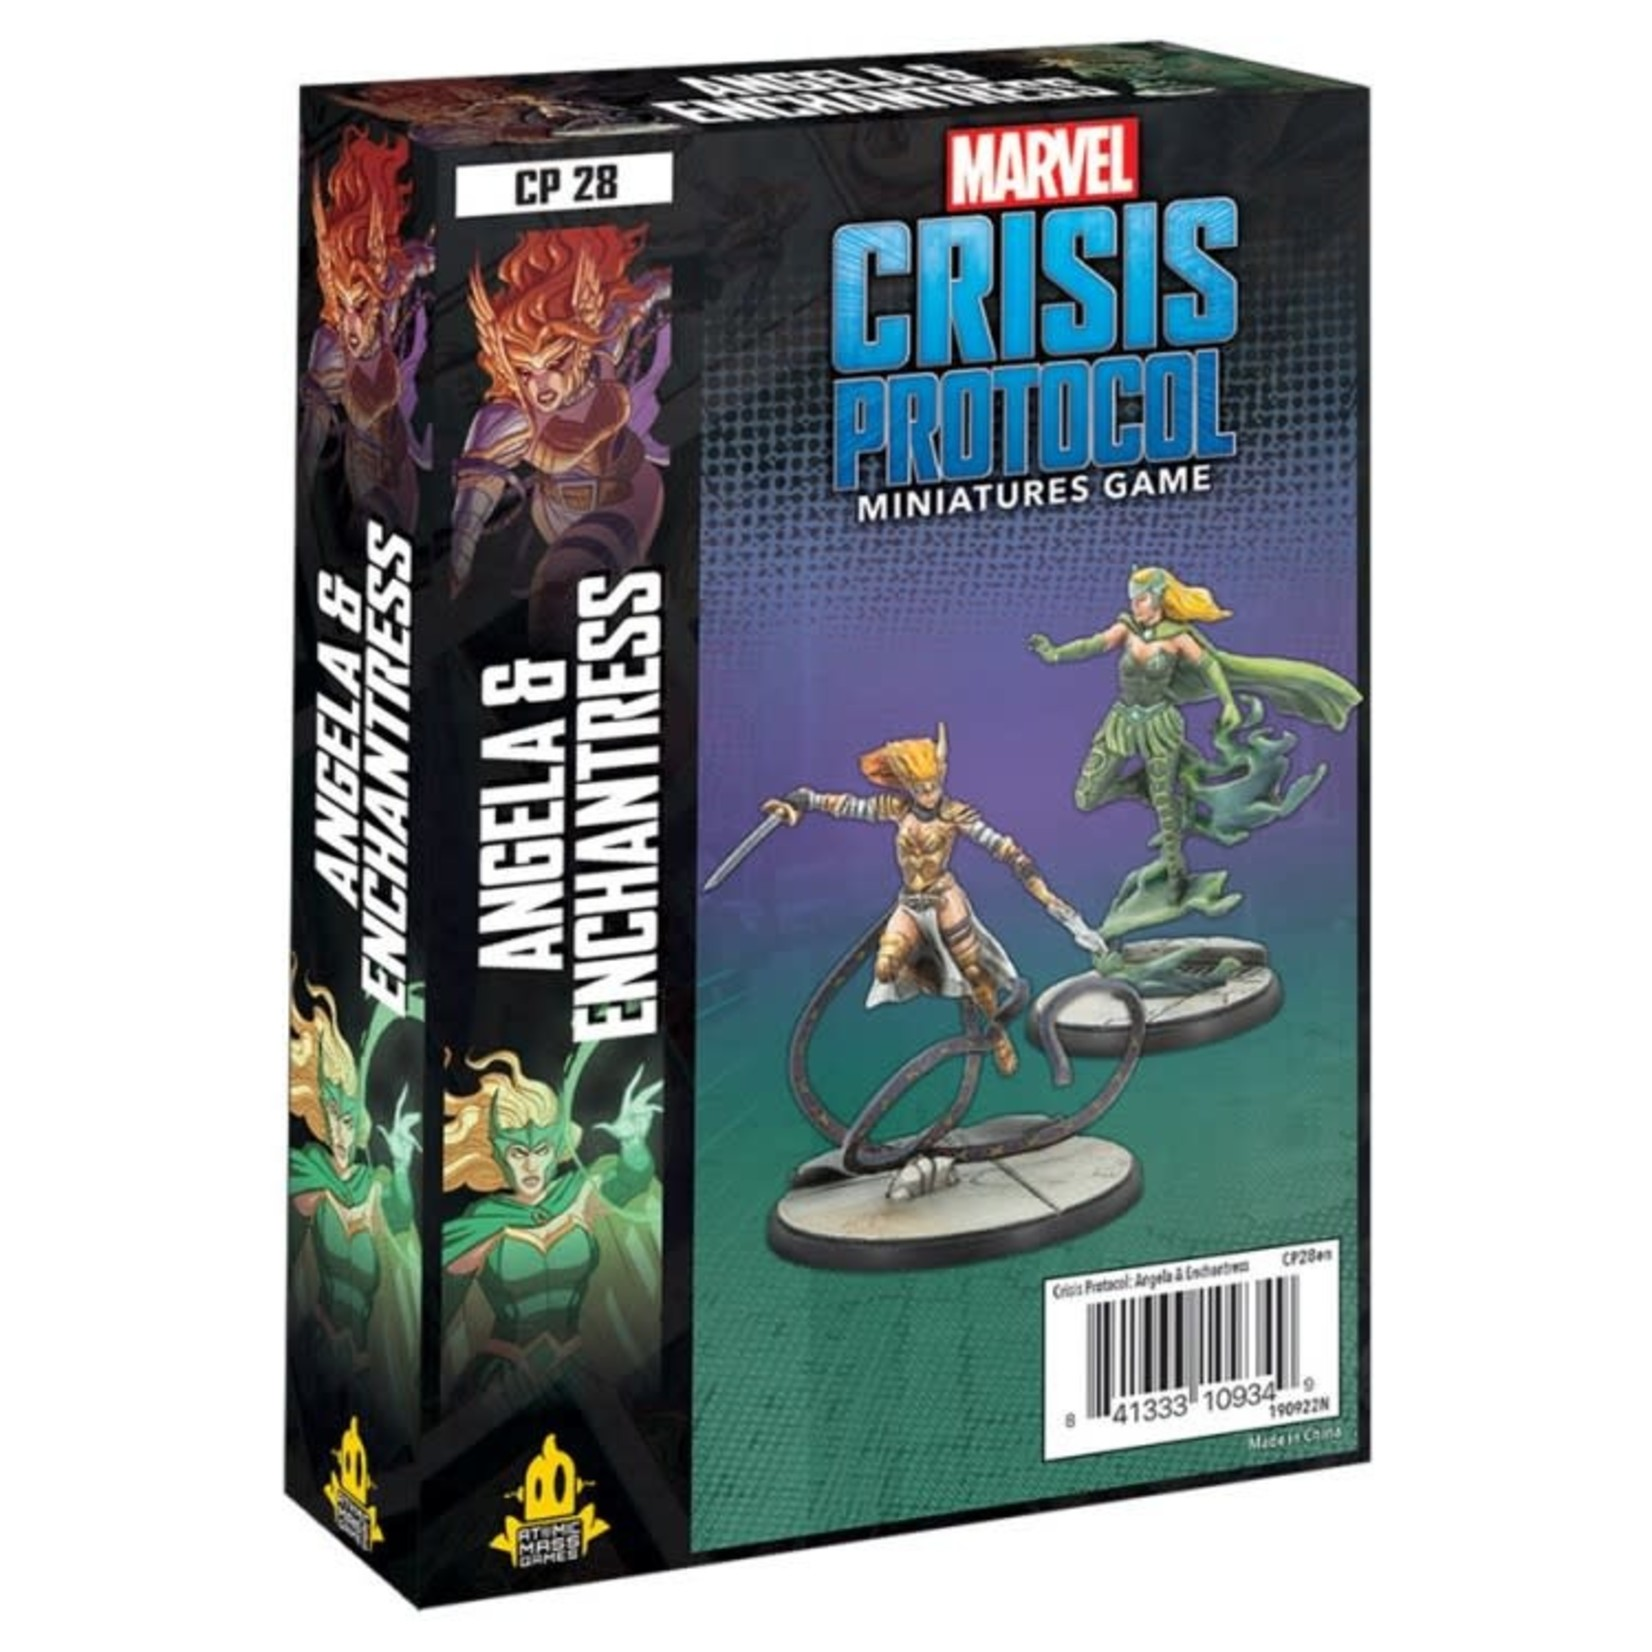 Asmodee Editions Marvel Crisis Protocol: Angela and Enchantress Character Pack